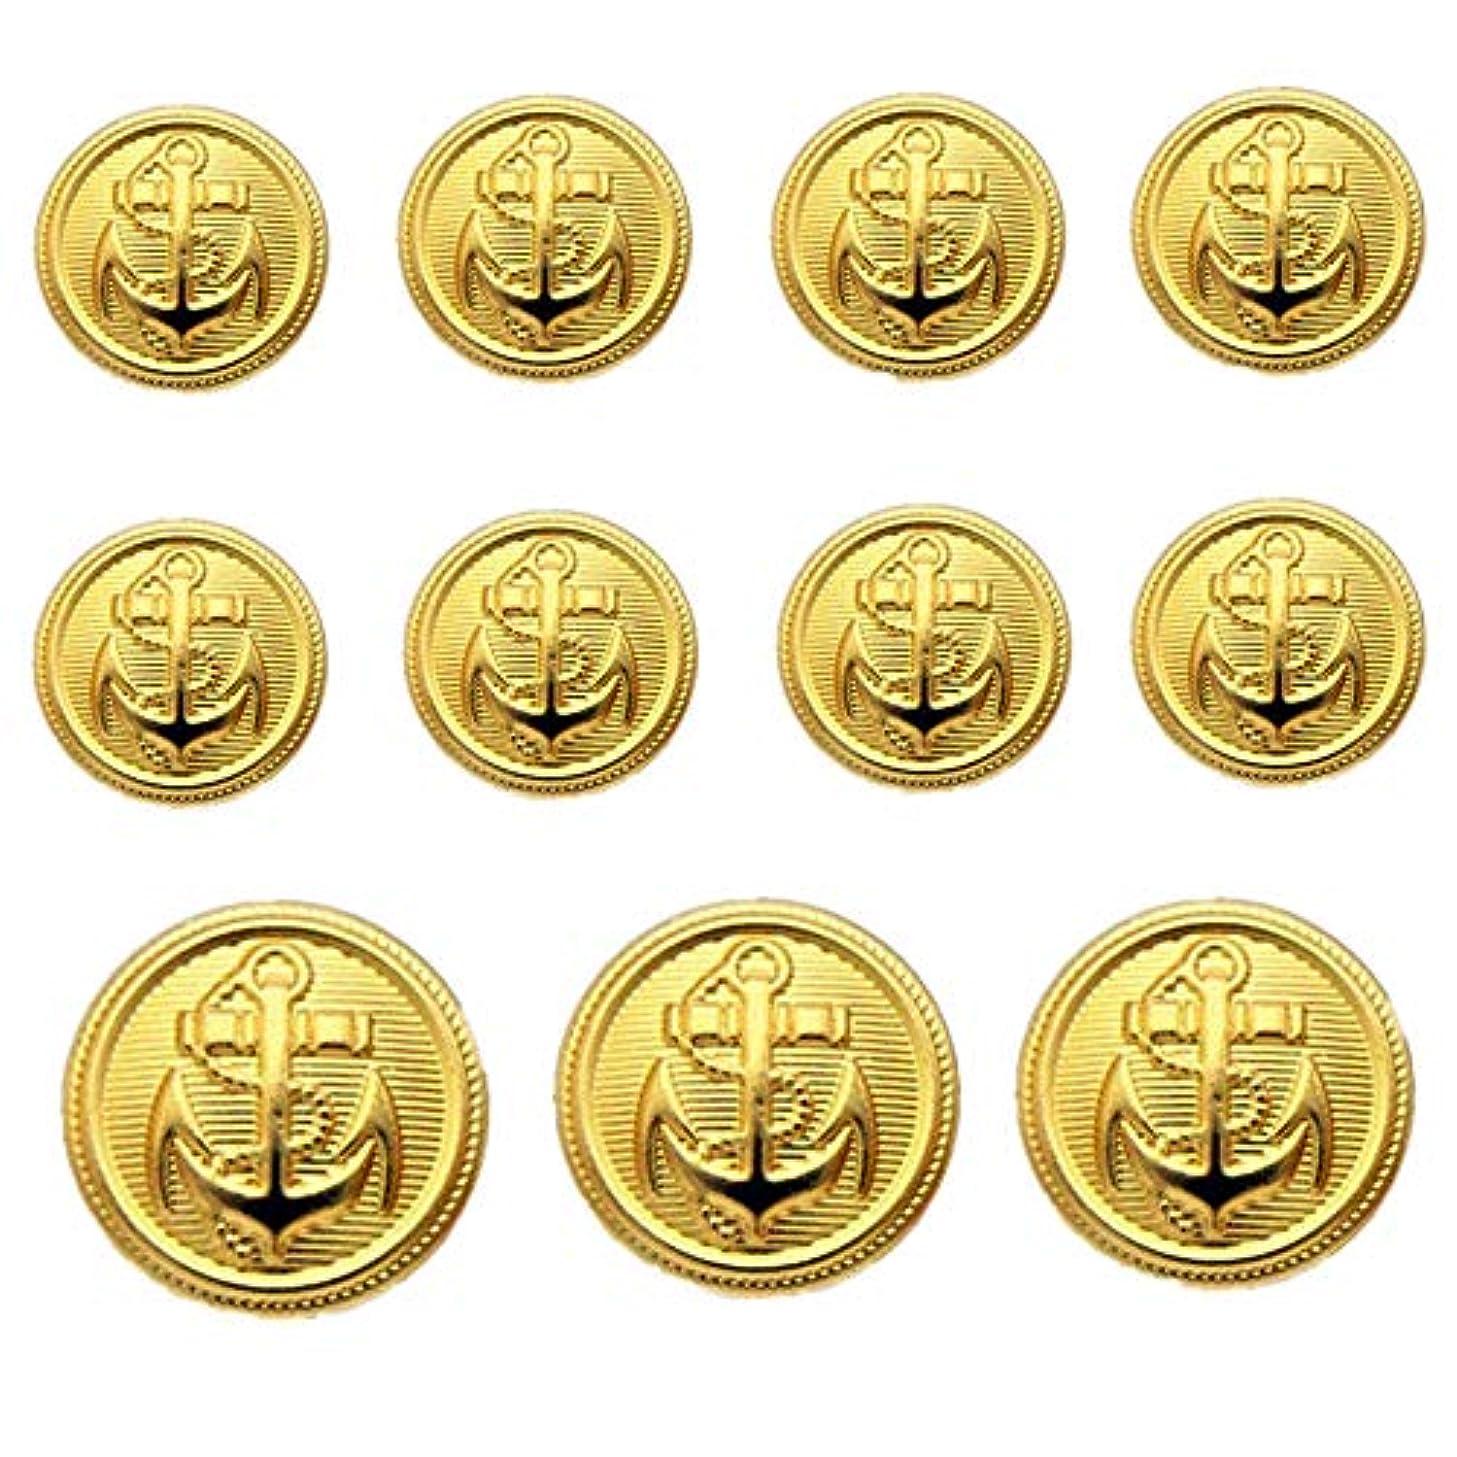 YCEE 11 Pieces Gold Metal Blazer Button Set - Naval Anchor Crest - for Blazer, Suits, Sport Coat, Uniform, Jacket nwebyb4350506